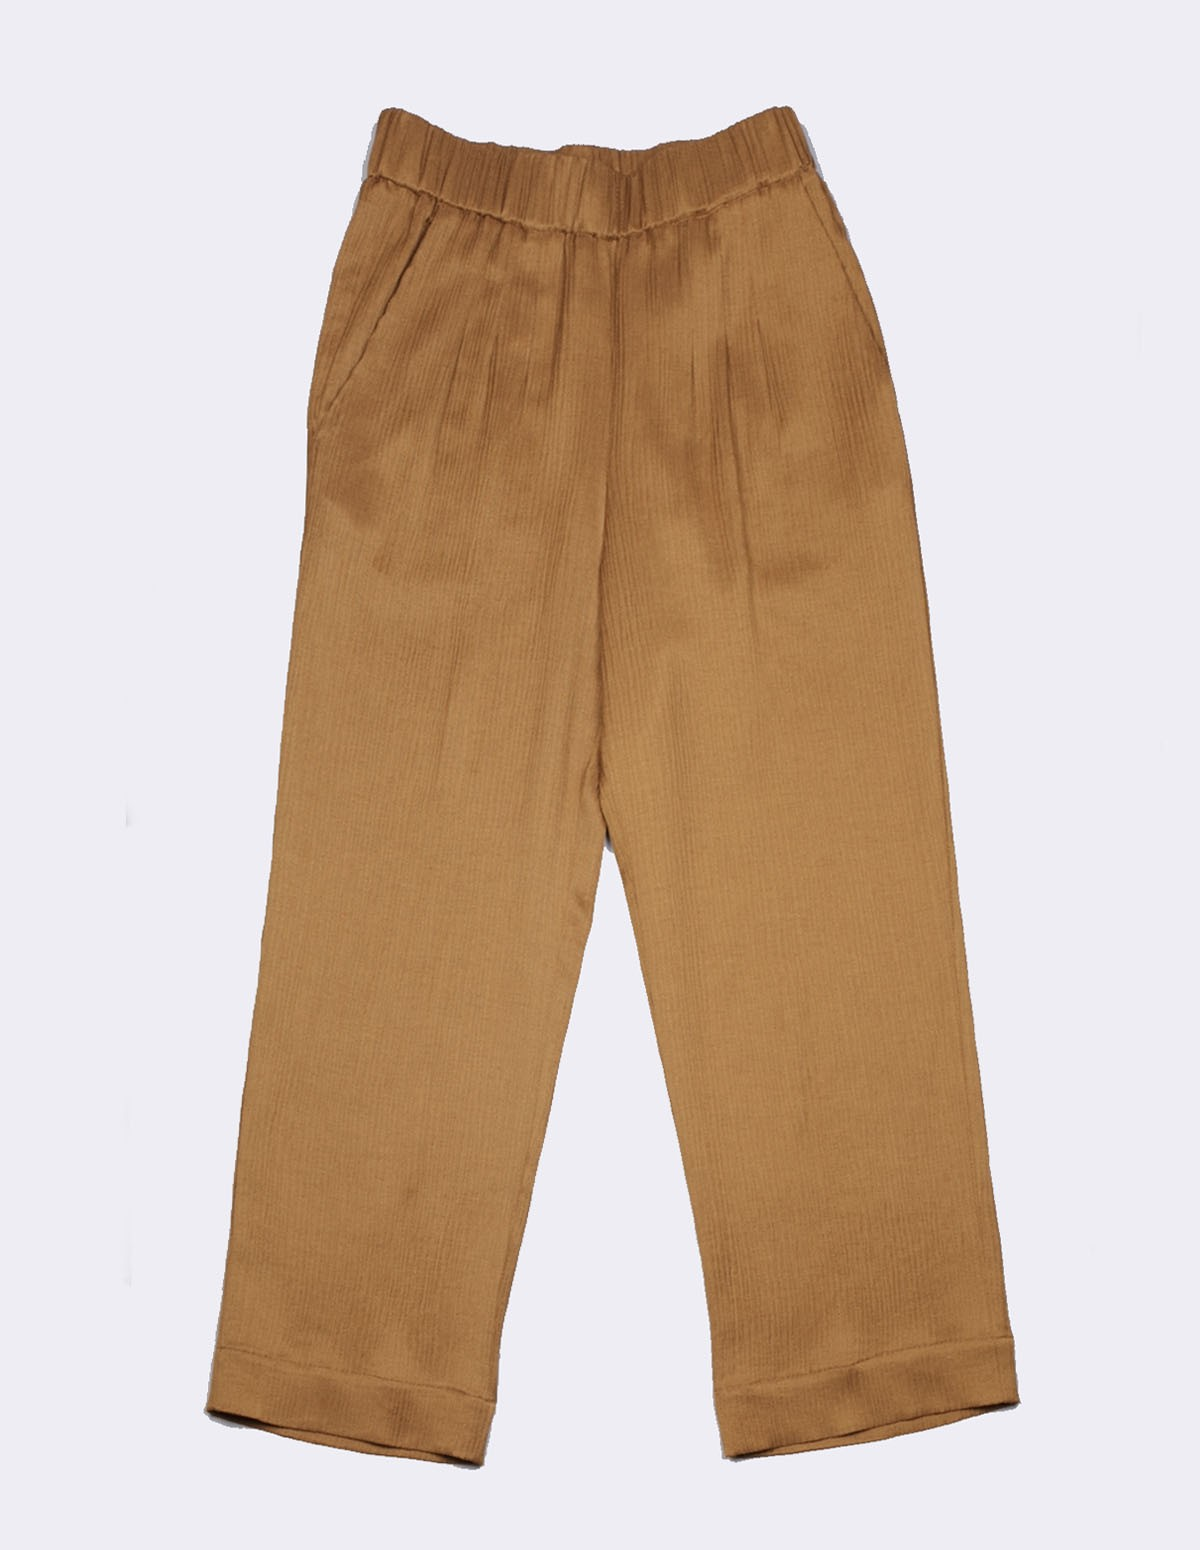 Pom 7142f/20668 Pants Exclu Ft